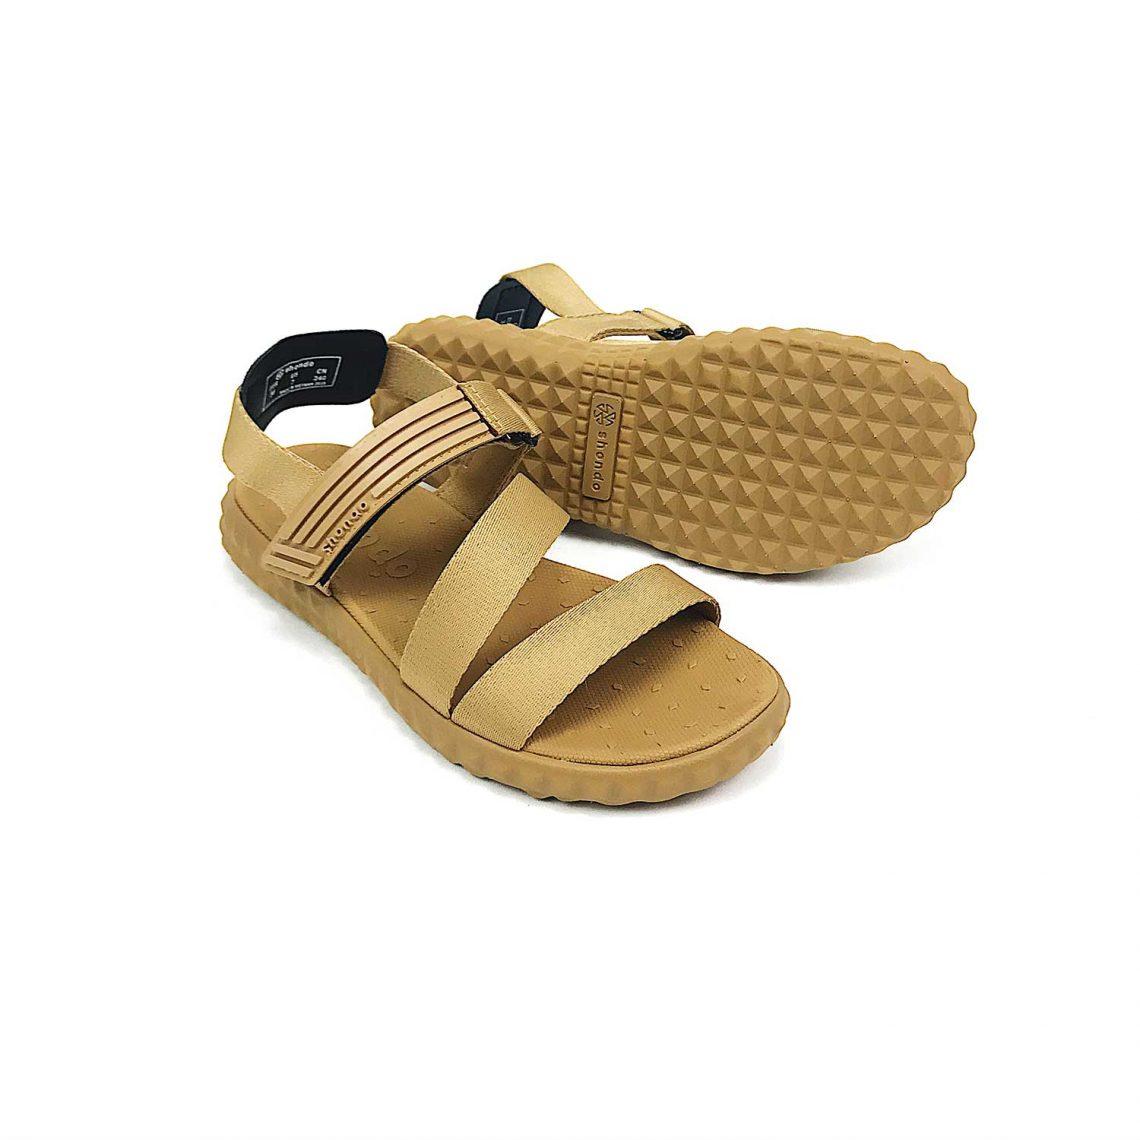 Giày Sandals Unisex SHONDO F6 F6M207 3